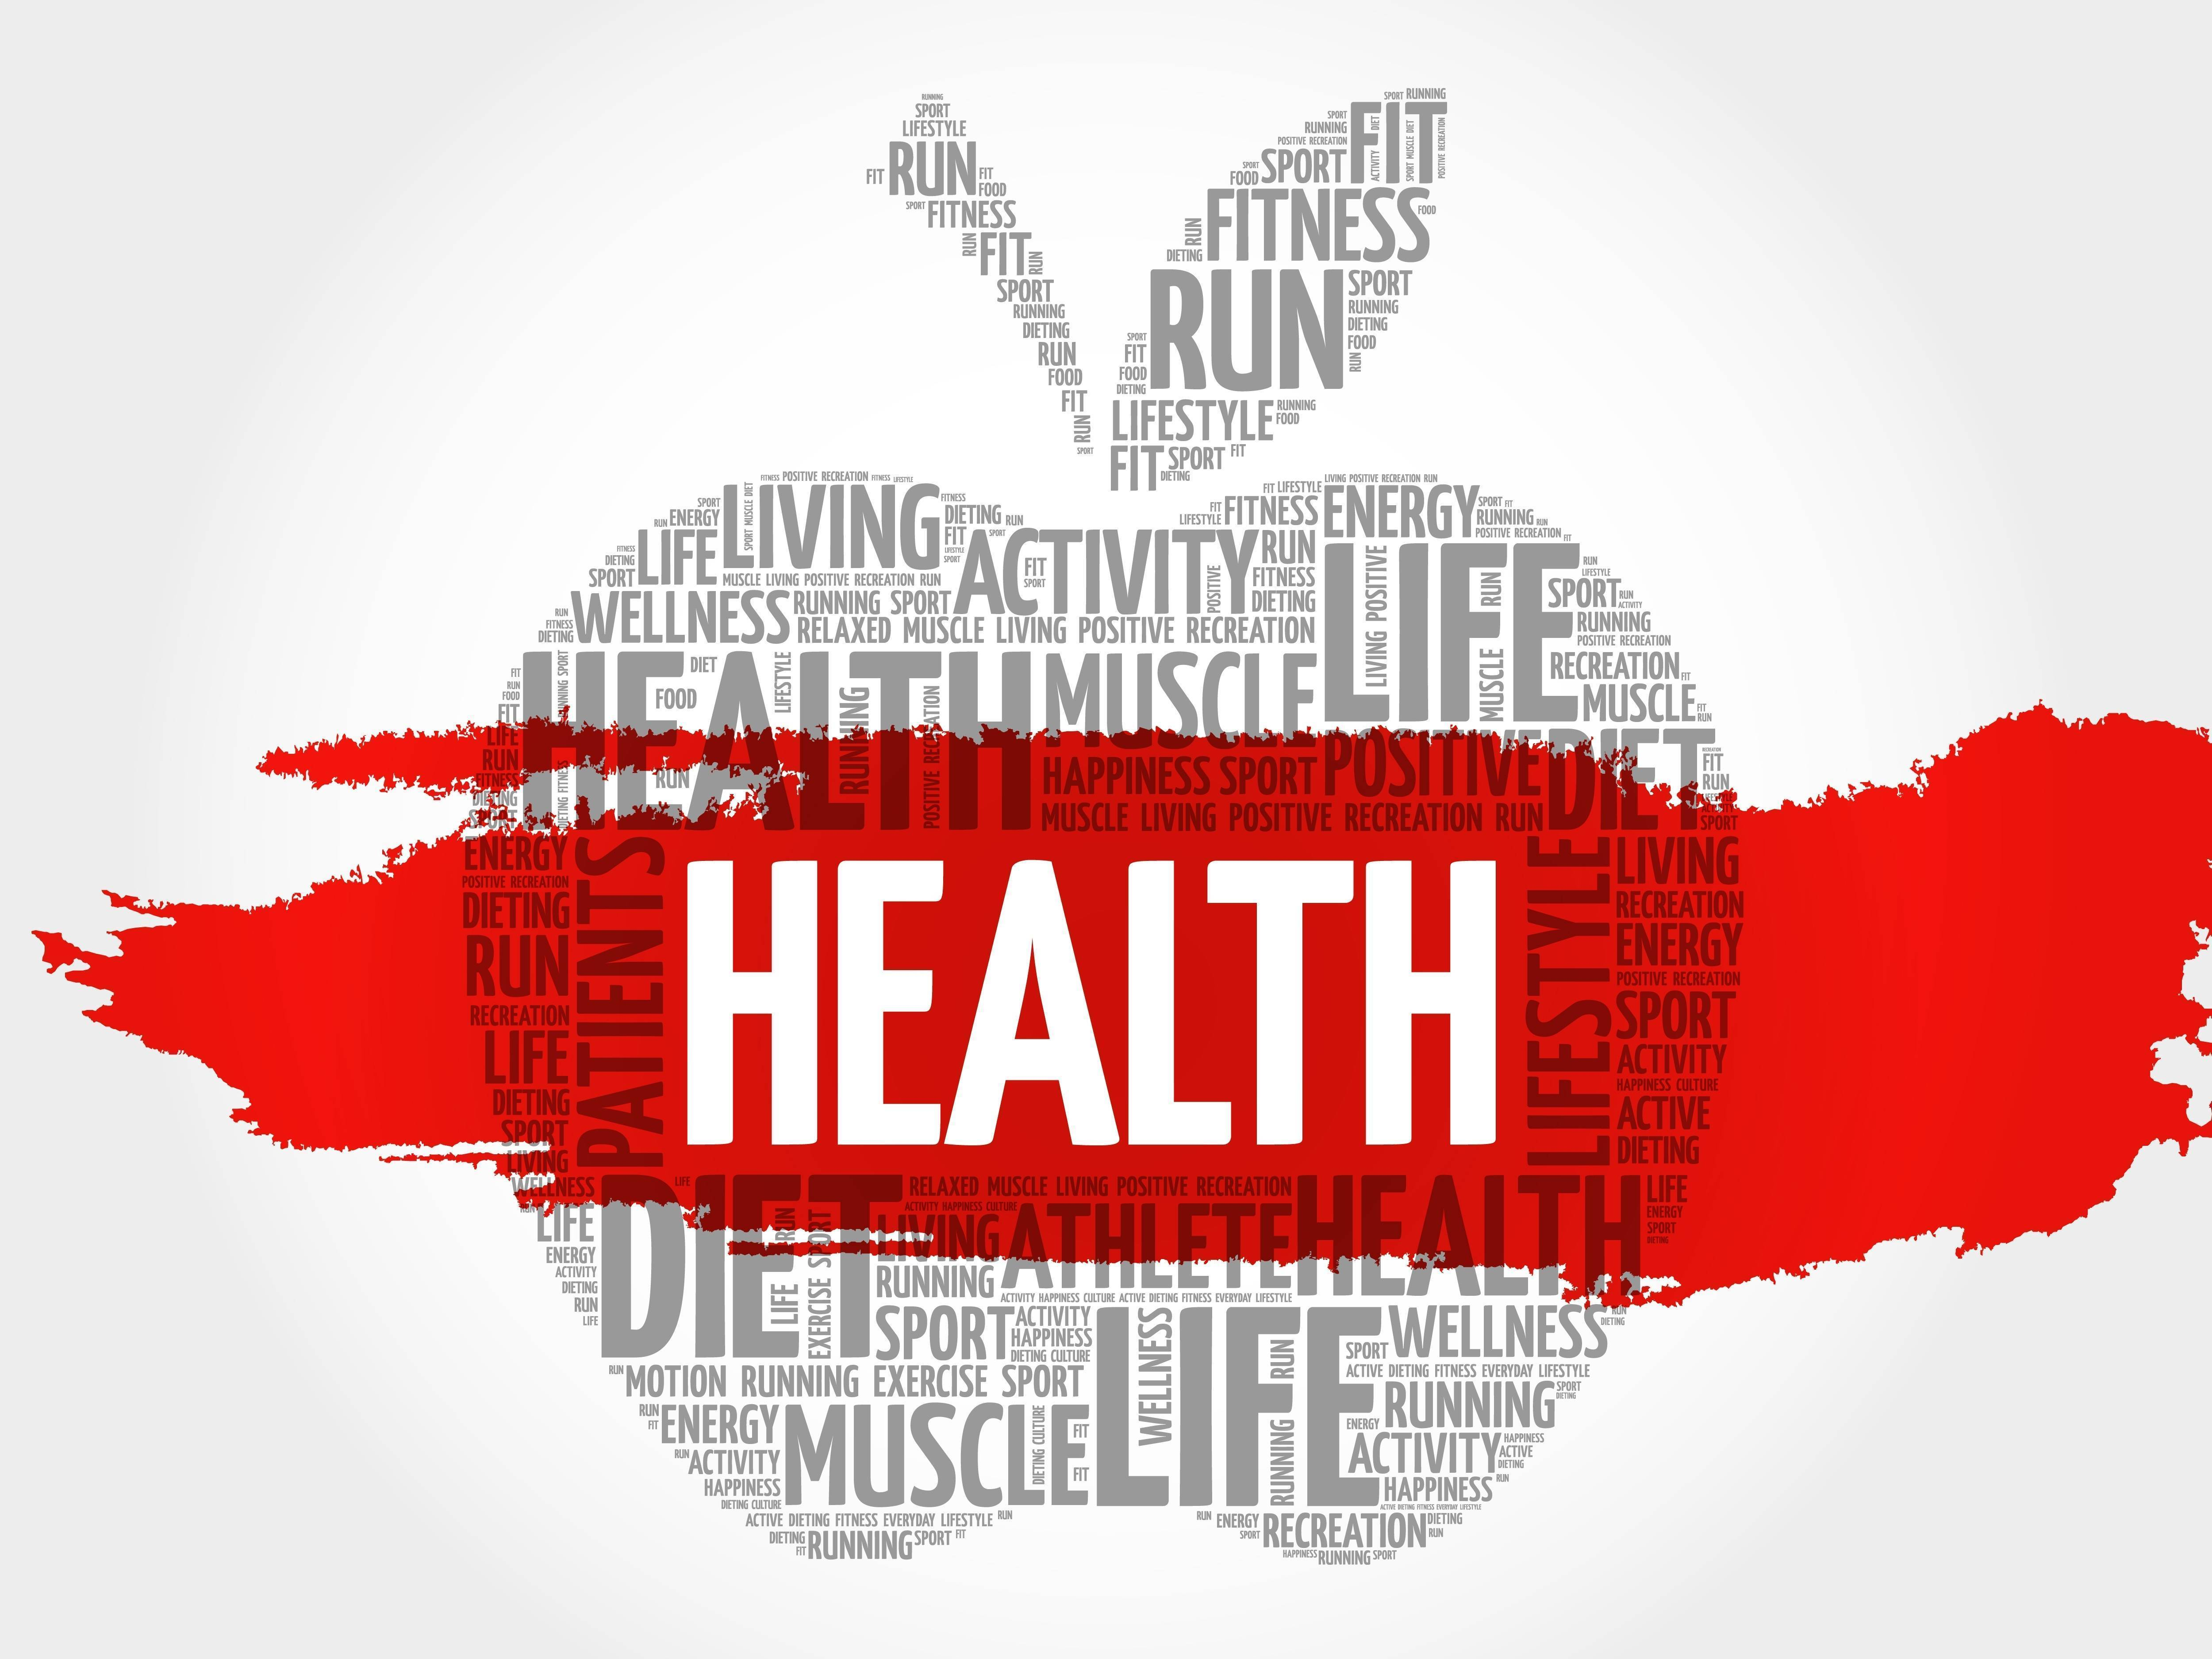 b5bda15f2299b8c94691_0a286d2605876148fd74_9eb8b53fc131321fa5c6_Health.jpg